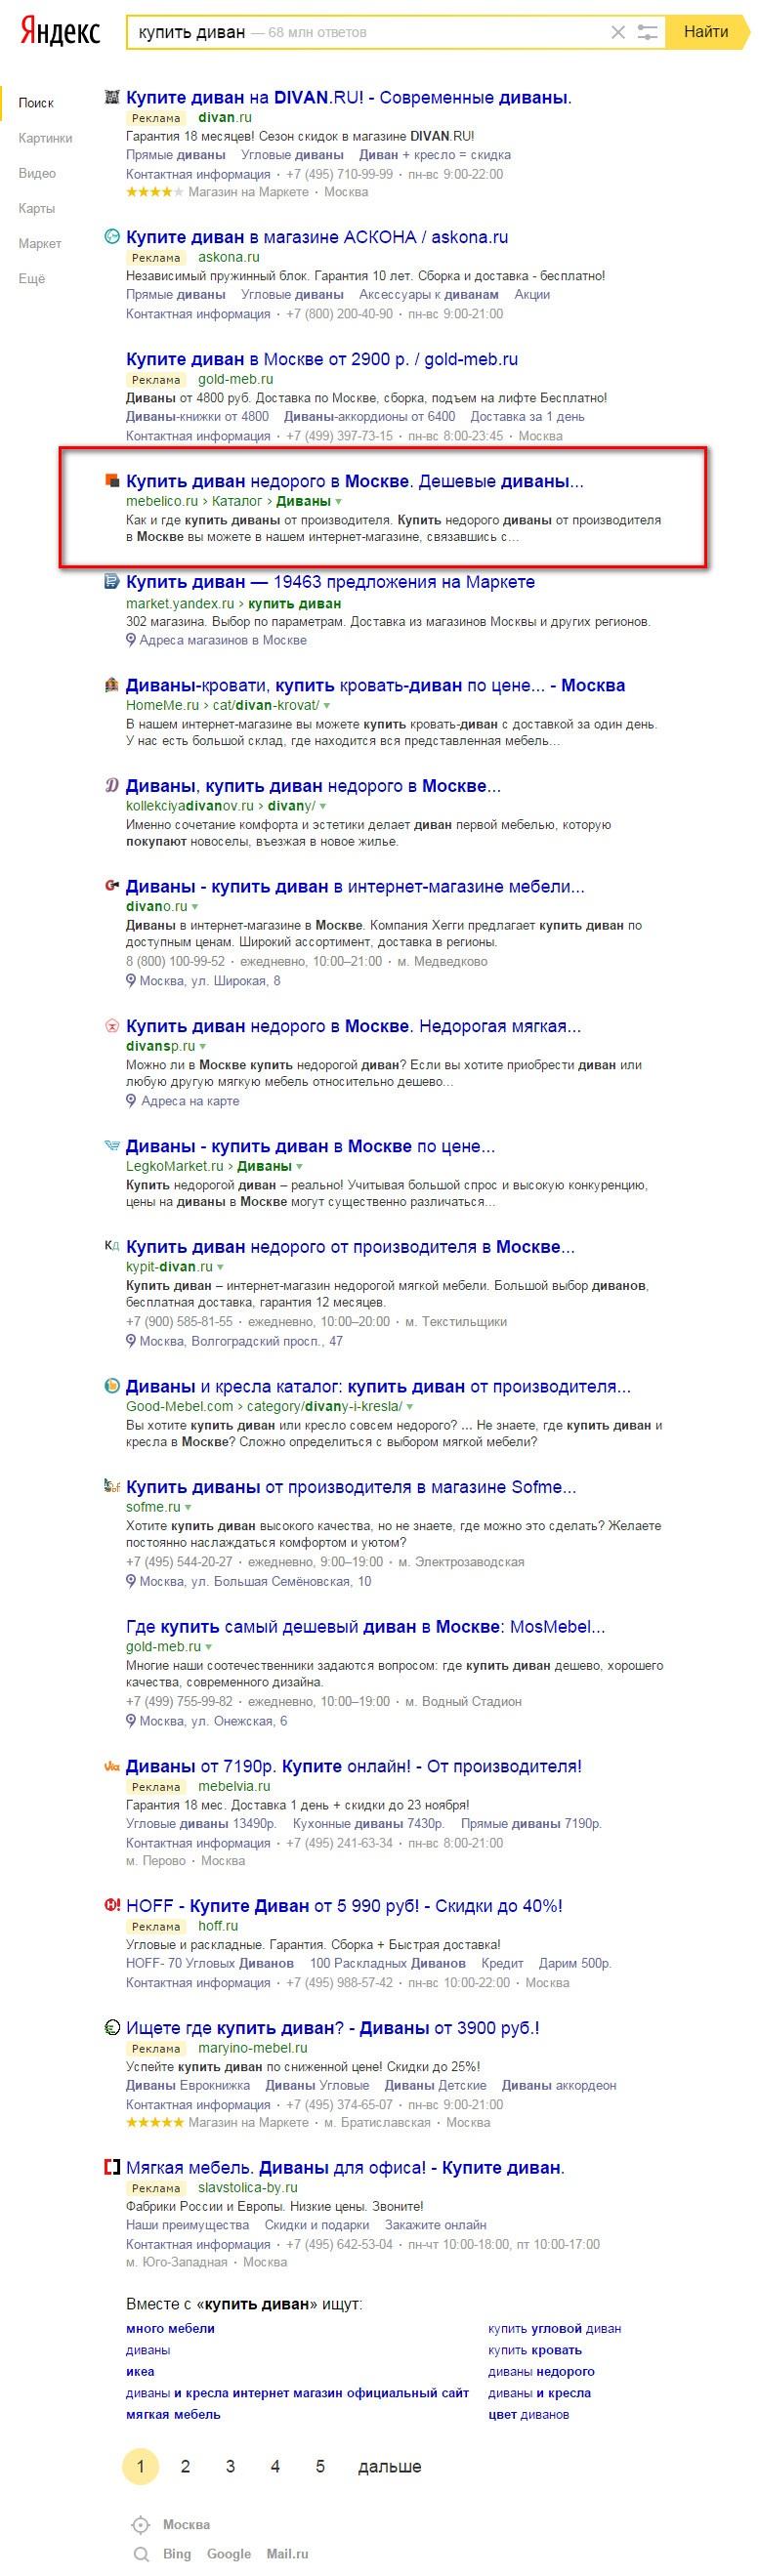 КУПИТЬ ДИВАН – ТОП 1 Yandex (Москва)